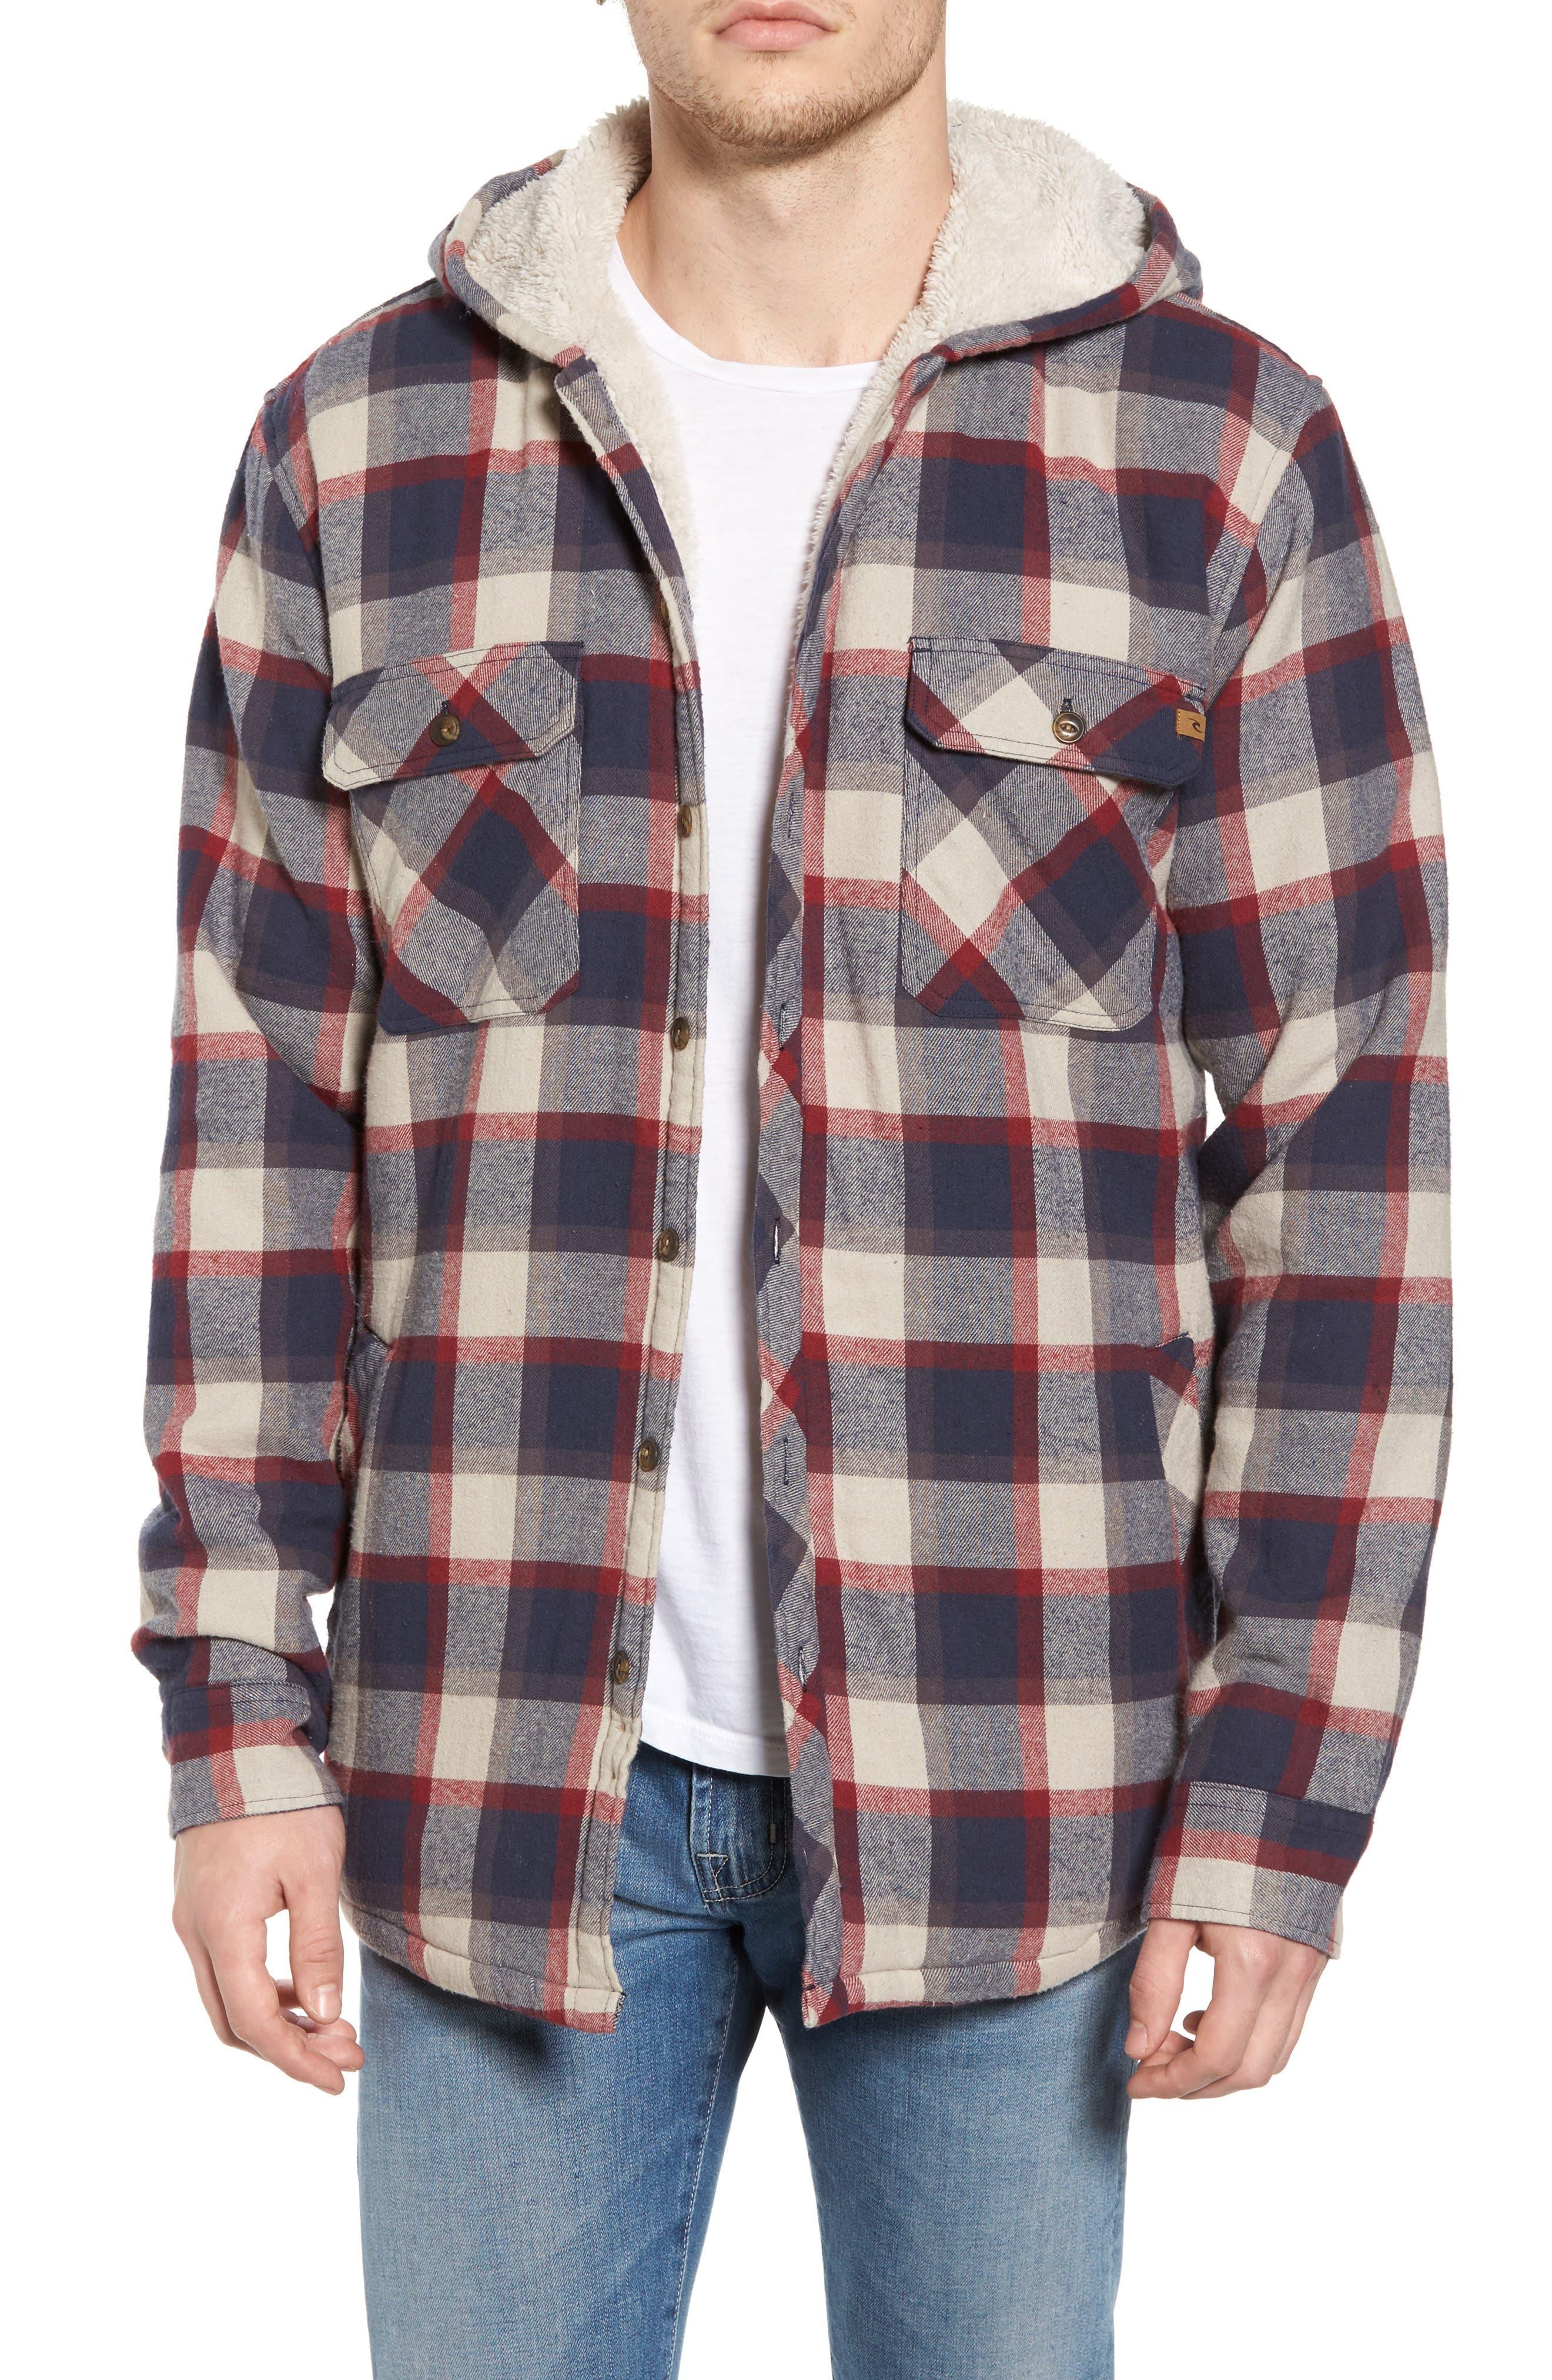 Rip Curl Pacheco Fleece Lined Shirt